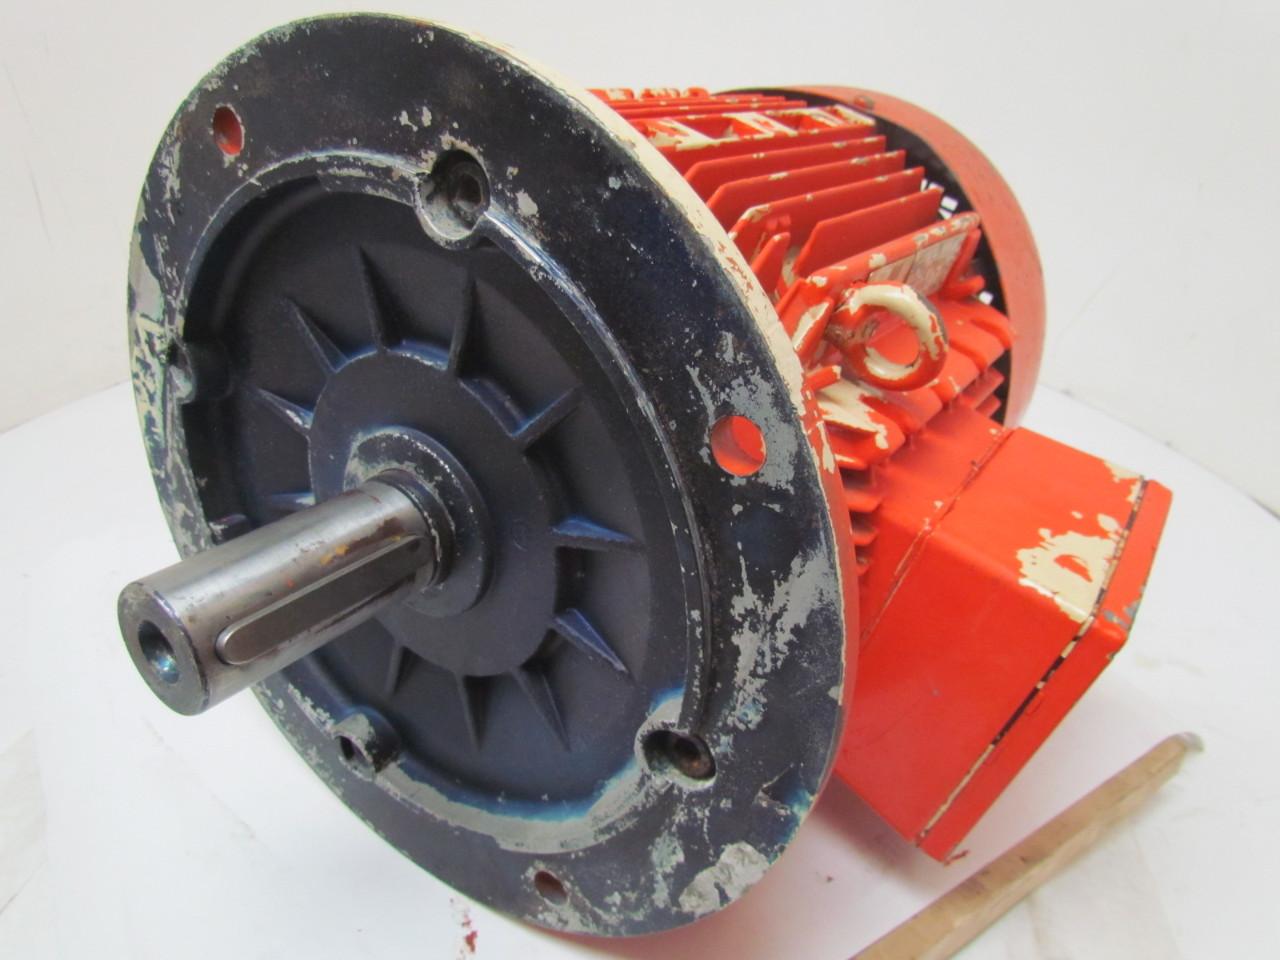 Siemens 4 6 Kw 1140 Rpm 480v Electric Motor 3 Ph Tefc 132m